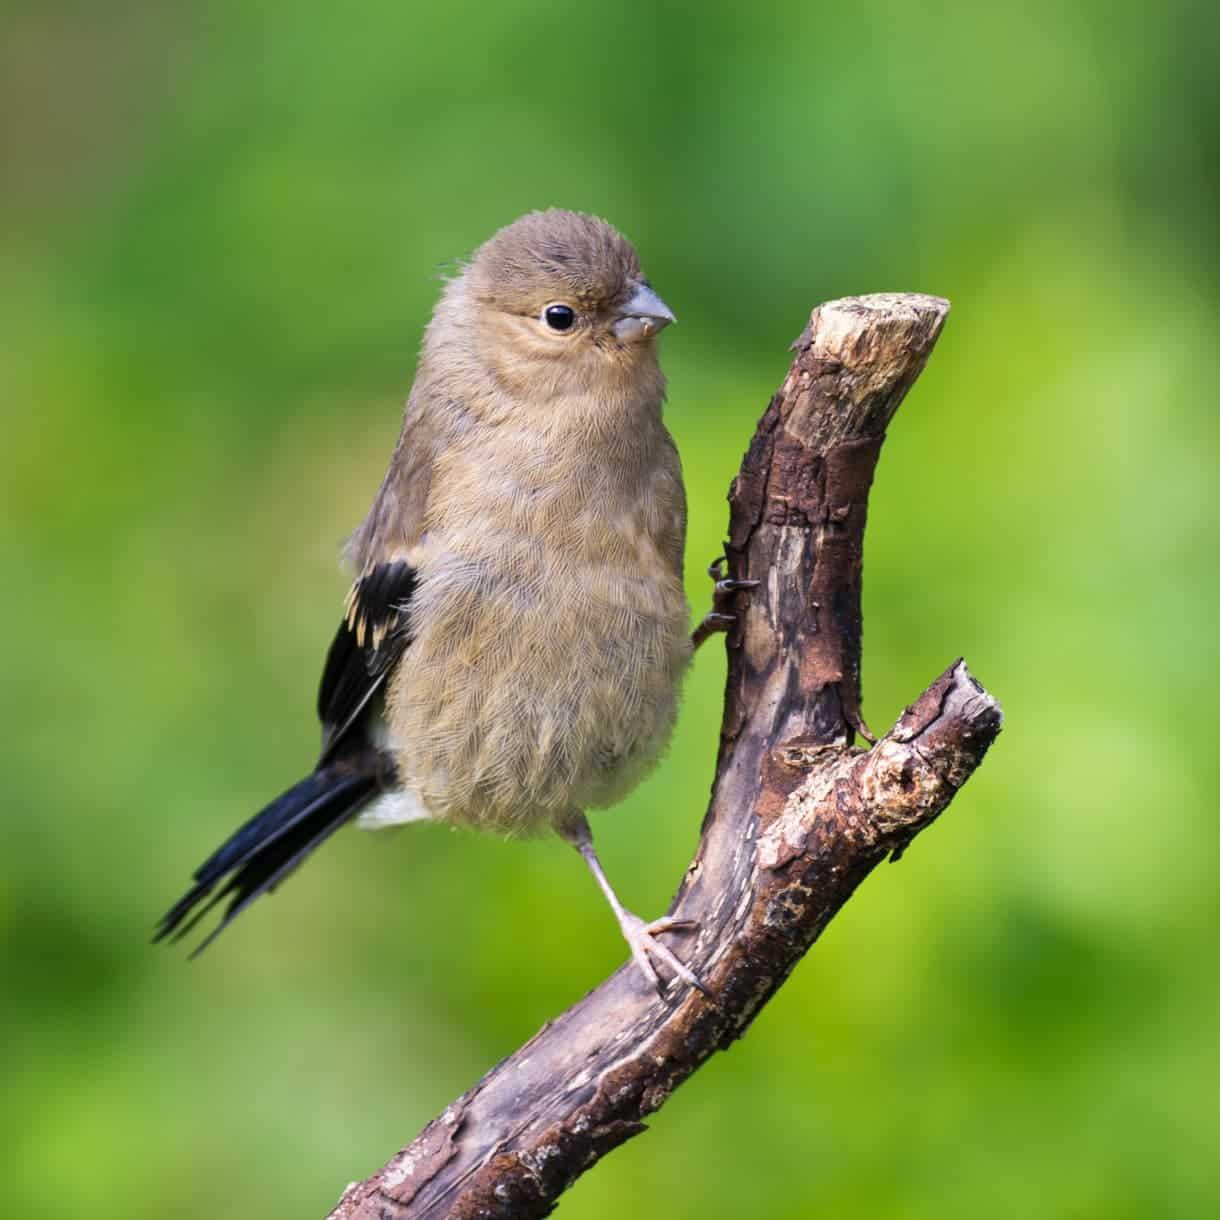 Fledgling Bullfinch